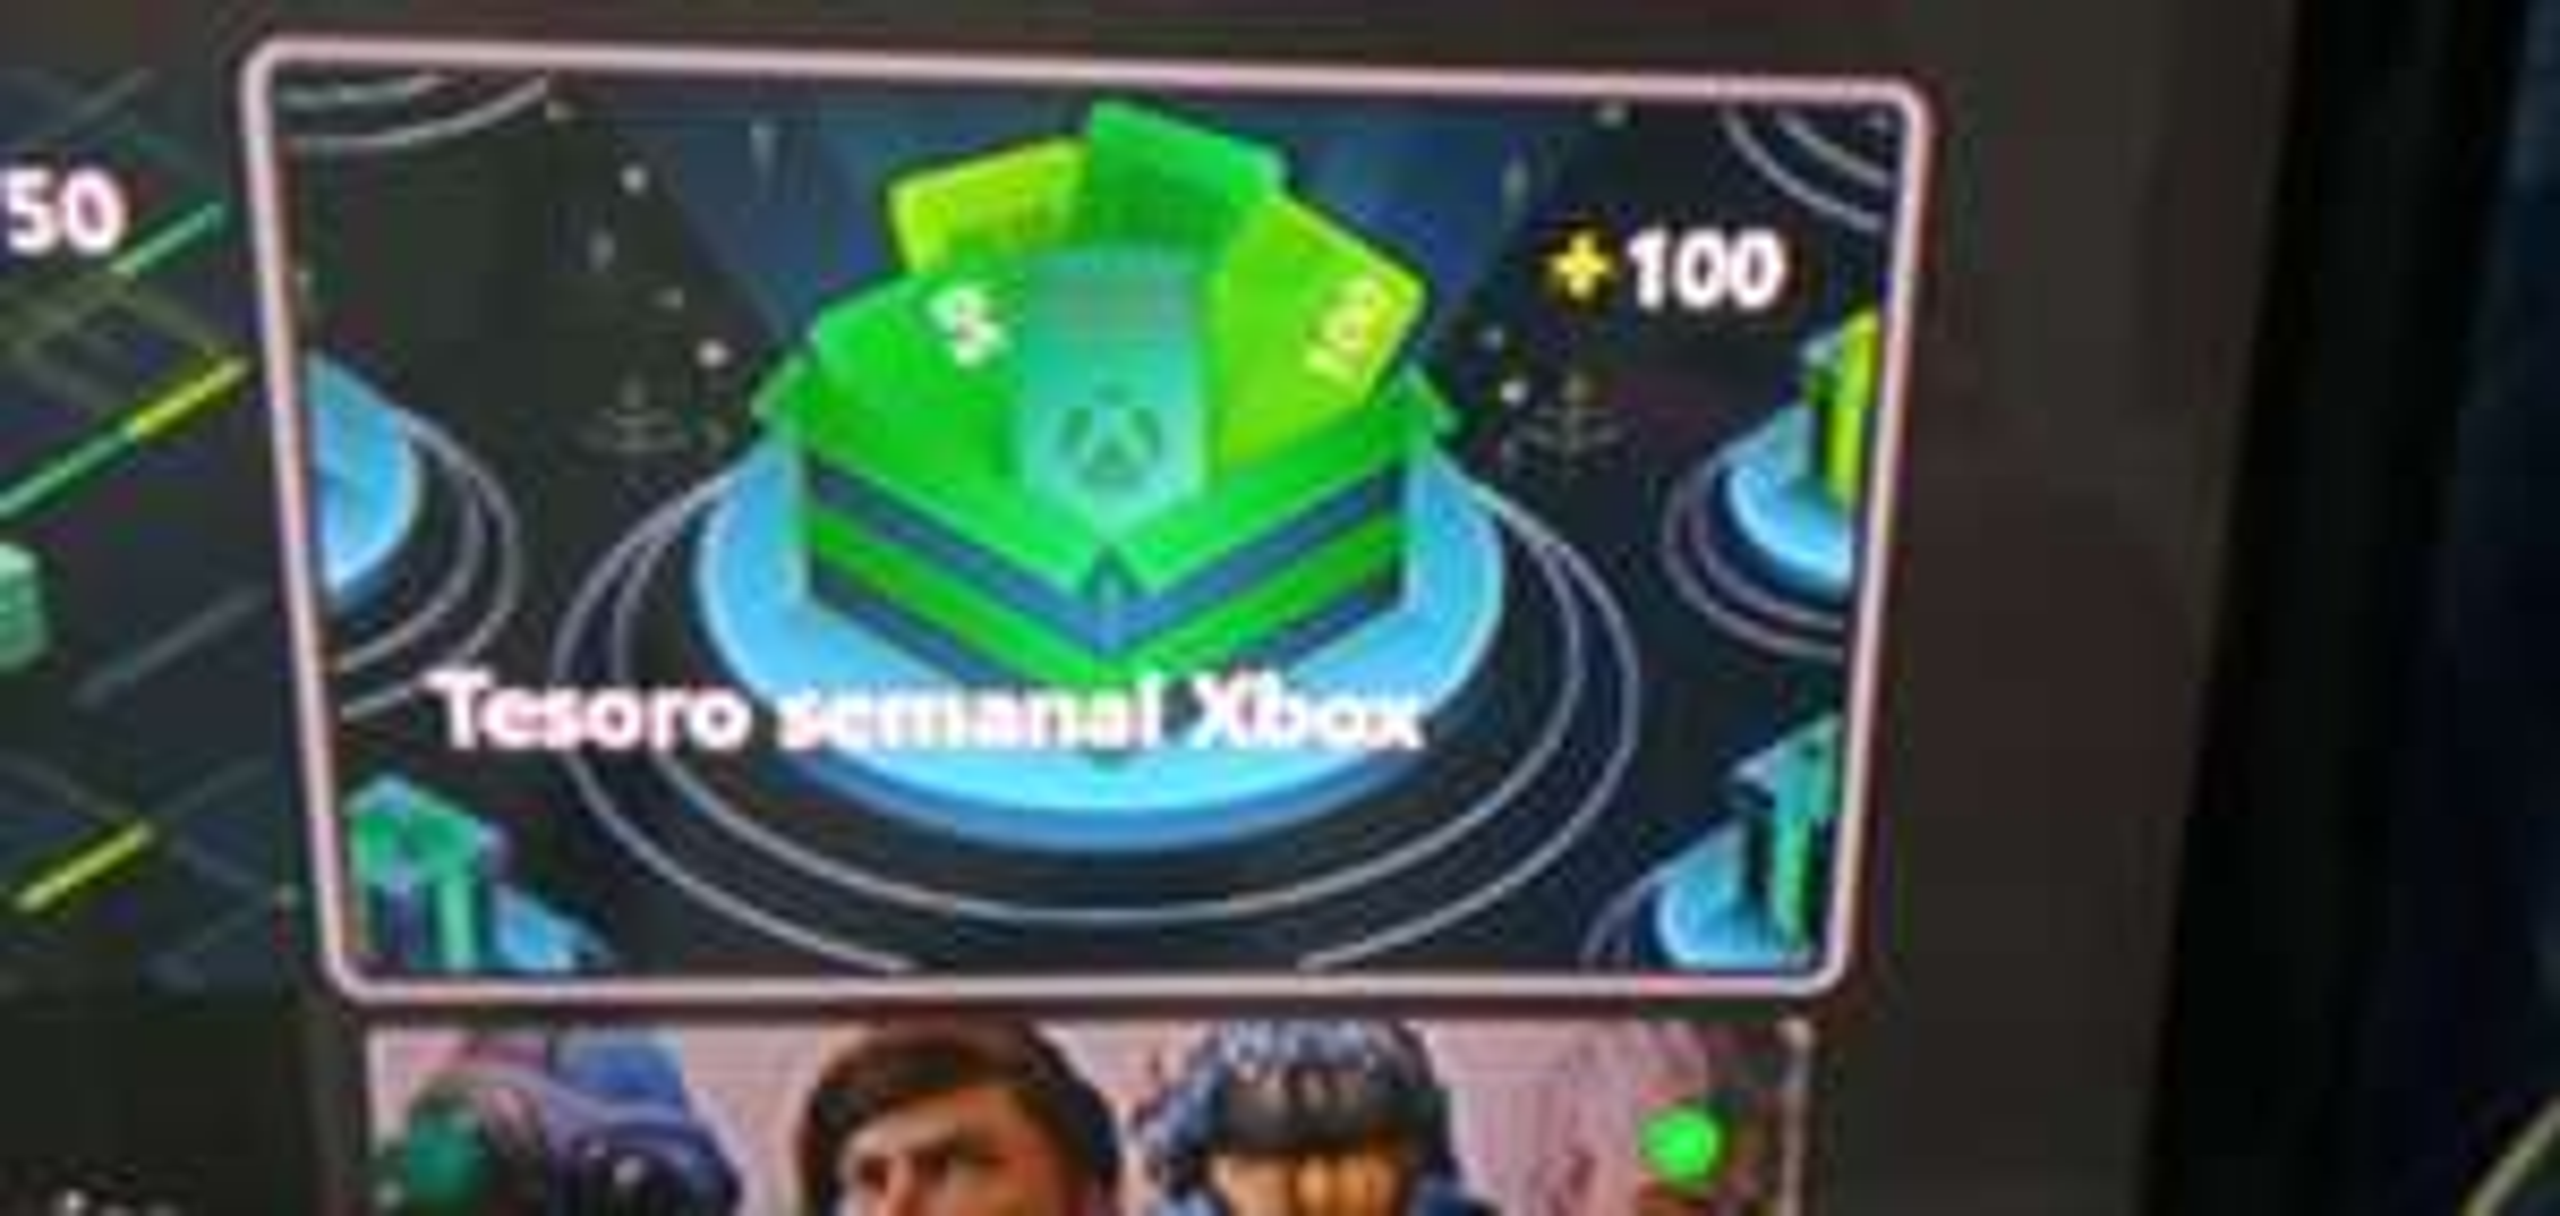 Xbox : 100 puntos gratis en Microsoft Rewards